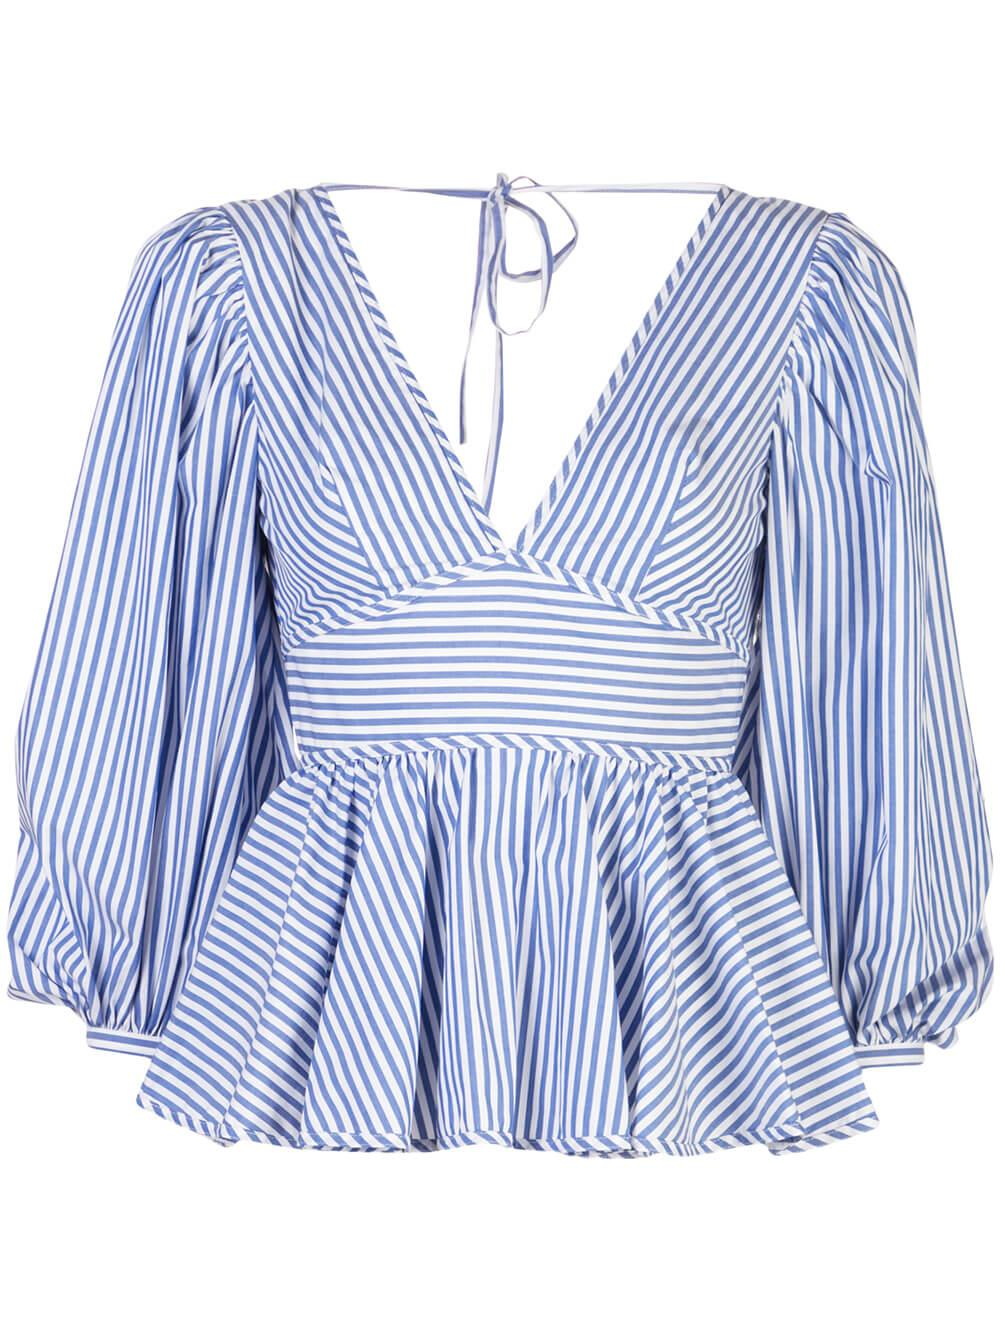 Luna Striped Shirting Peplum Top Item # 138-3064-BLWS